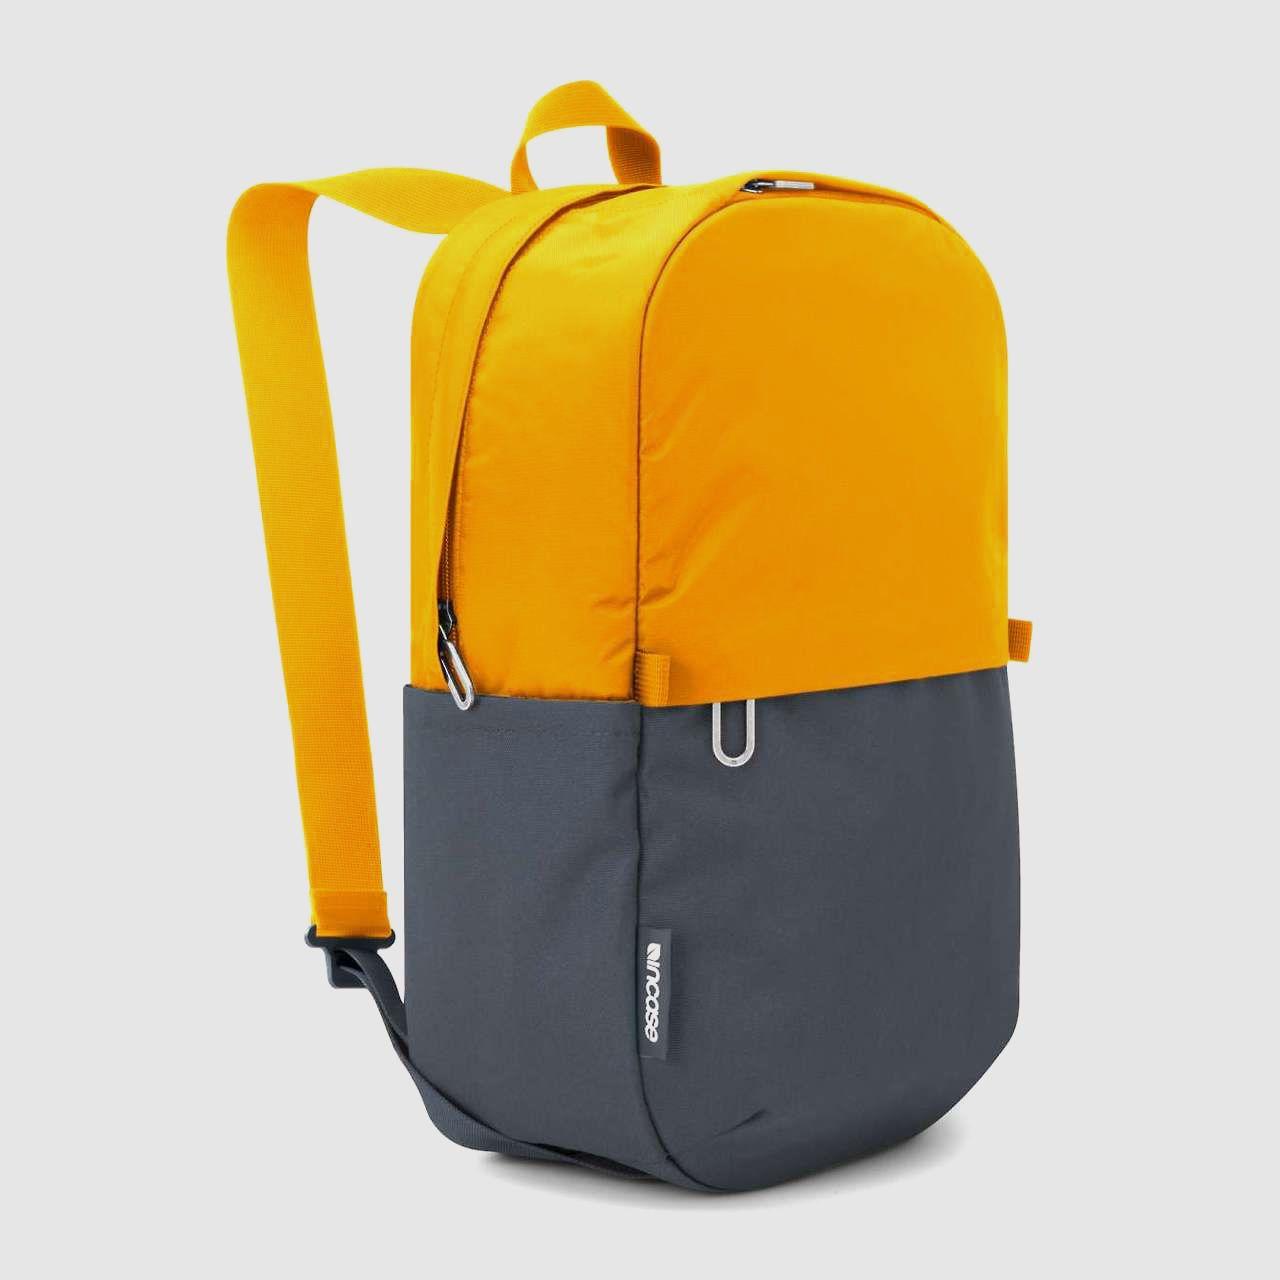 Incase backpack (color, materials) | industrial design | Pinterest ...